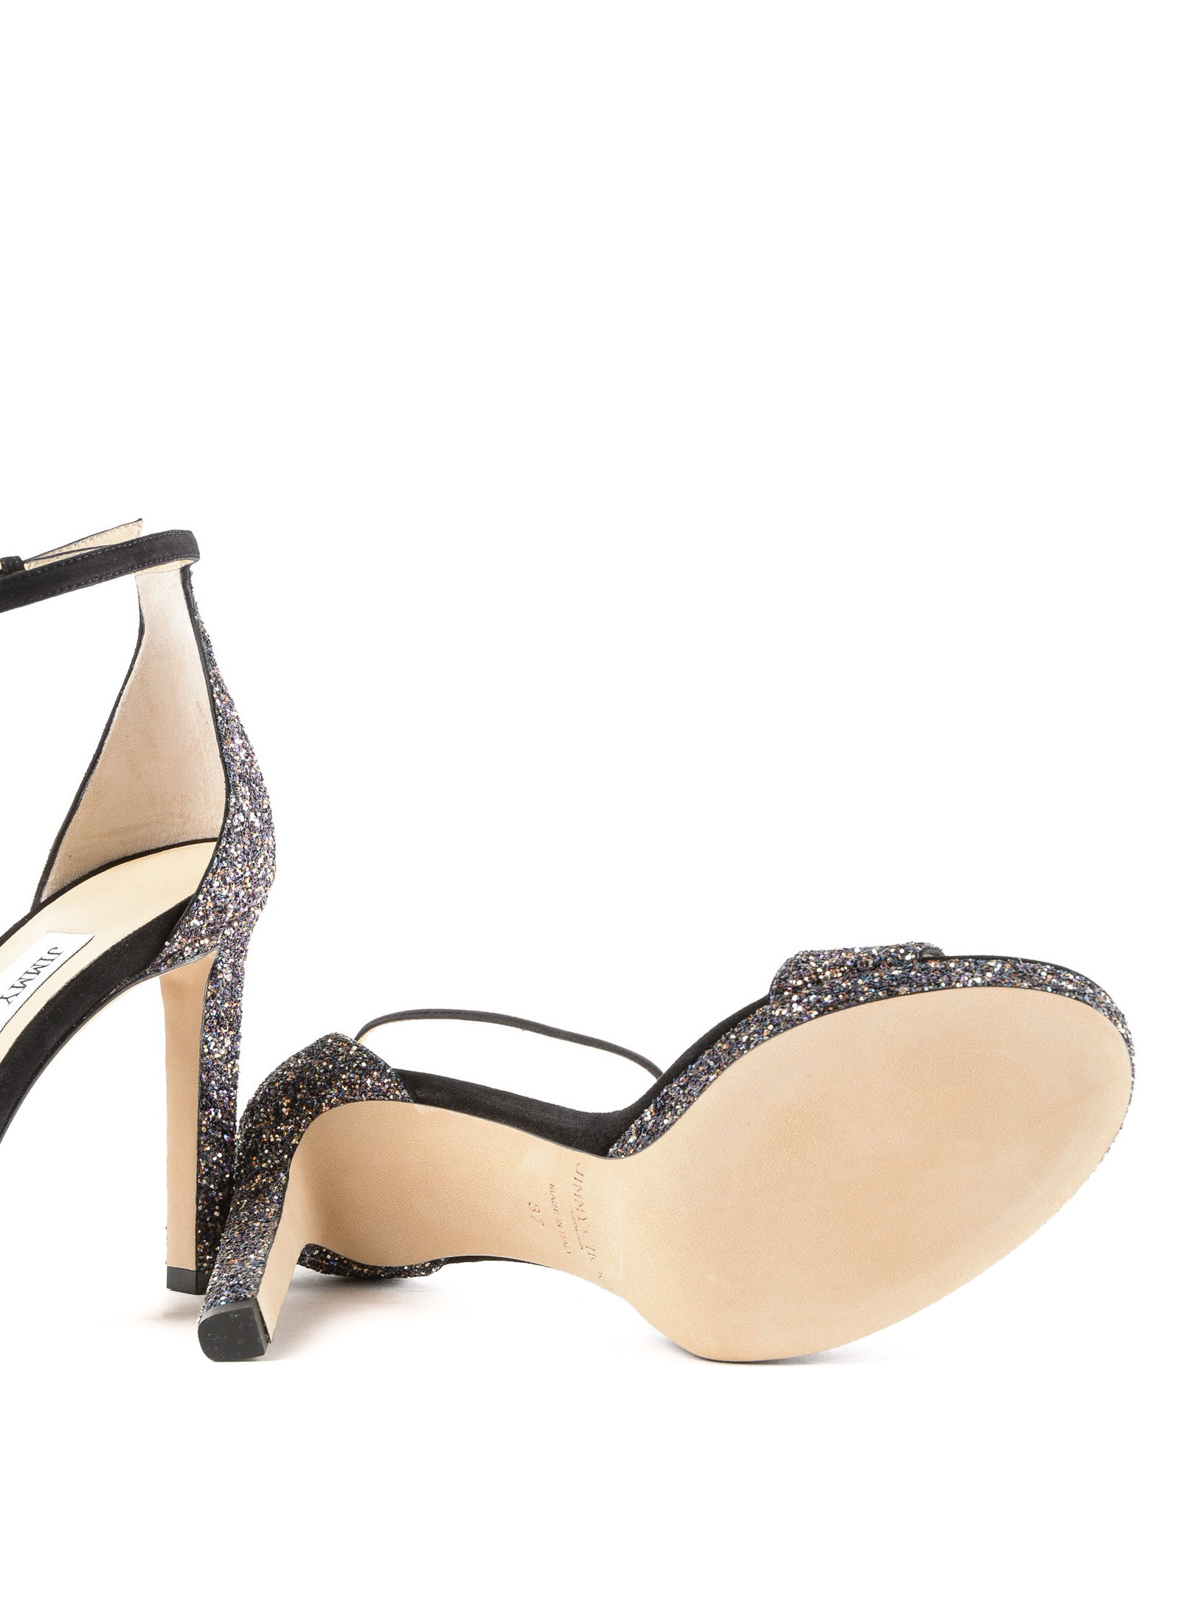 9b6a4bd1118 Jimmy Choo - Misty twilight glitter sandals - sandals - MISTY 100 ...